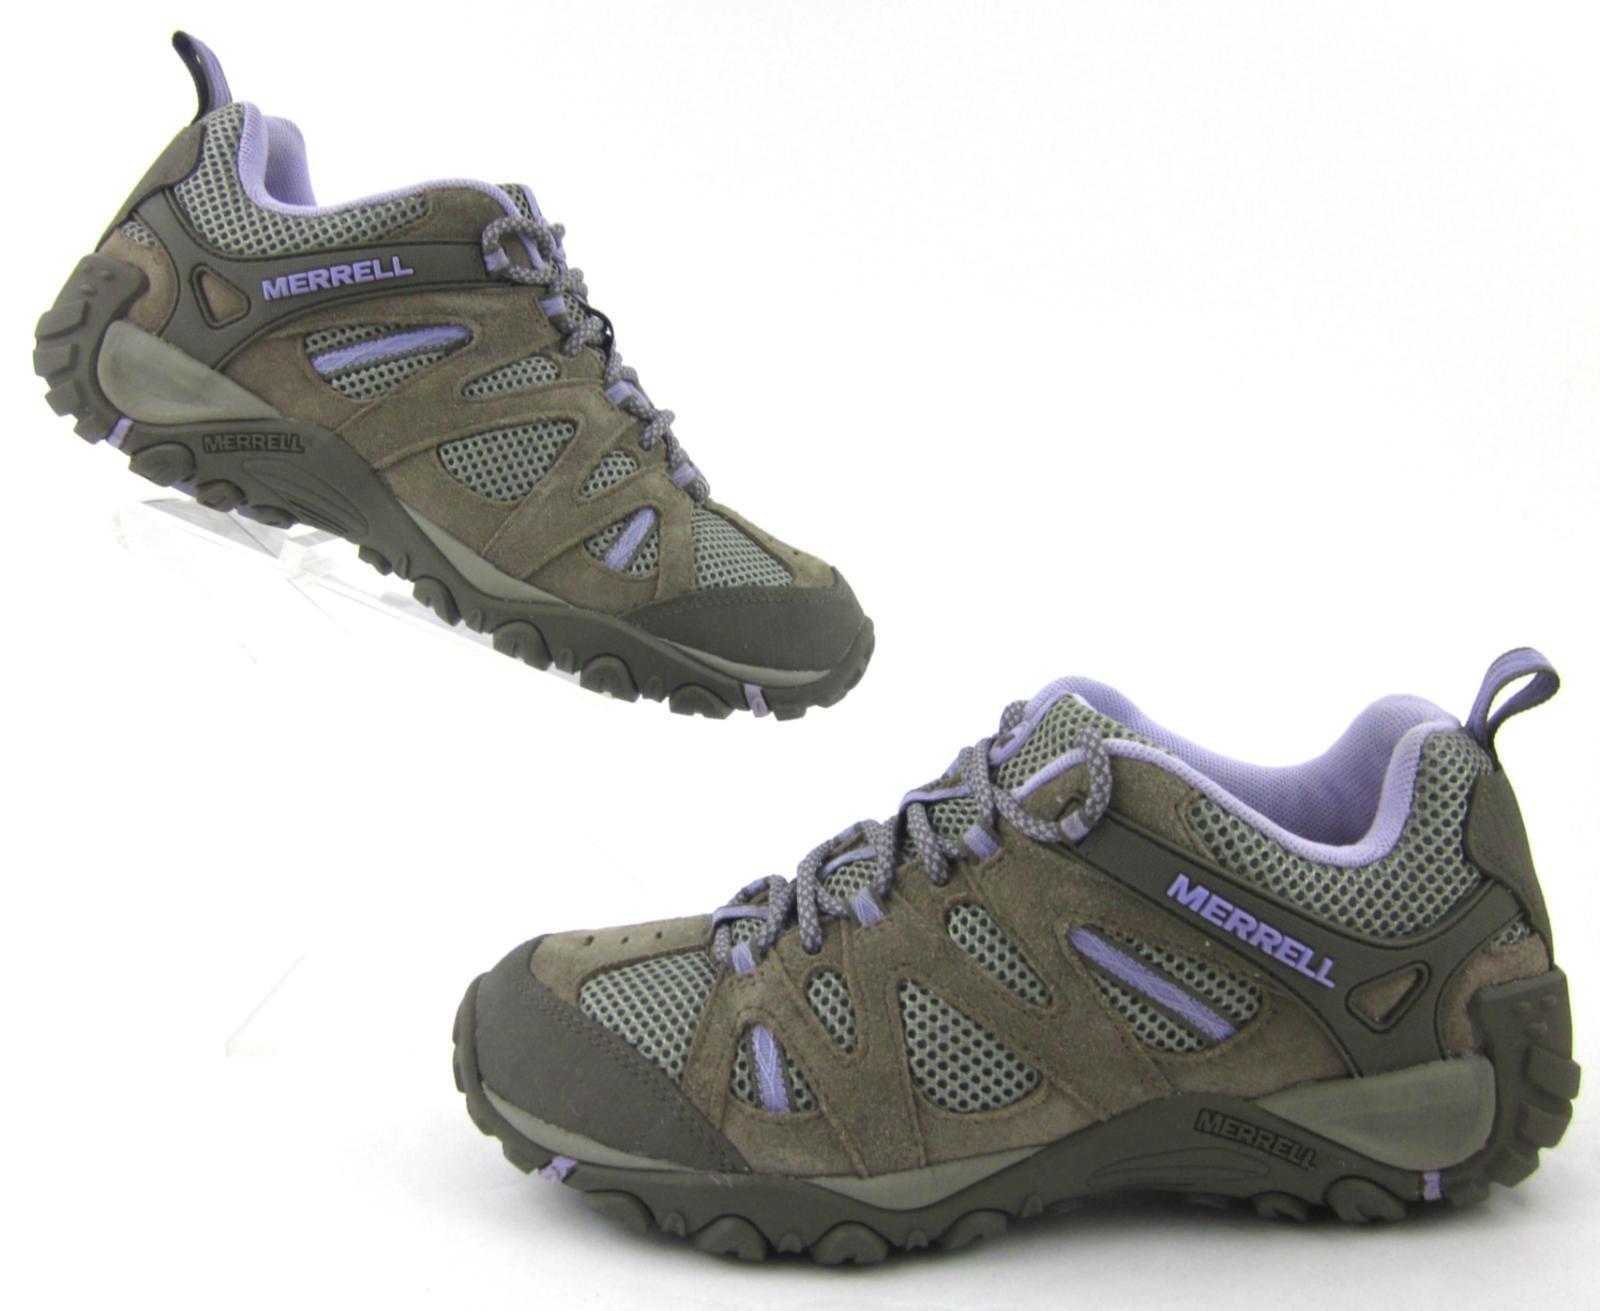 Merrell Yokota blueeff Ventilator Hiking shoes Brown   Lavender US 8